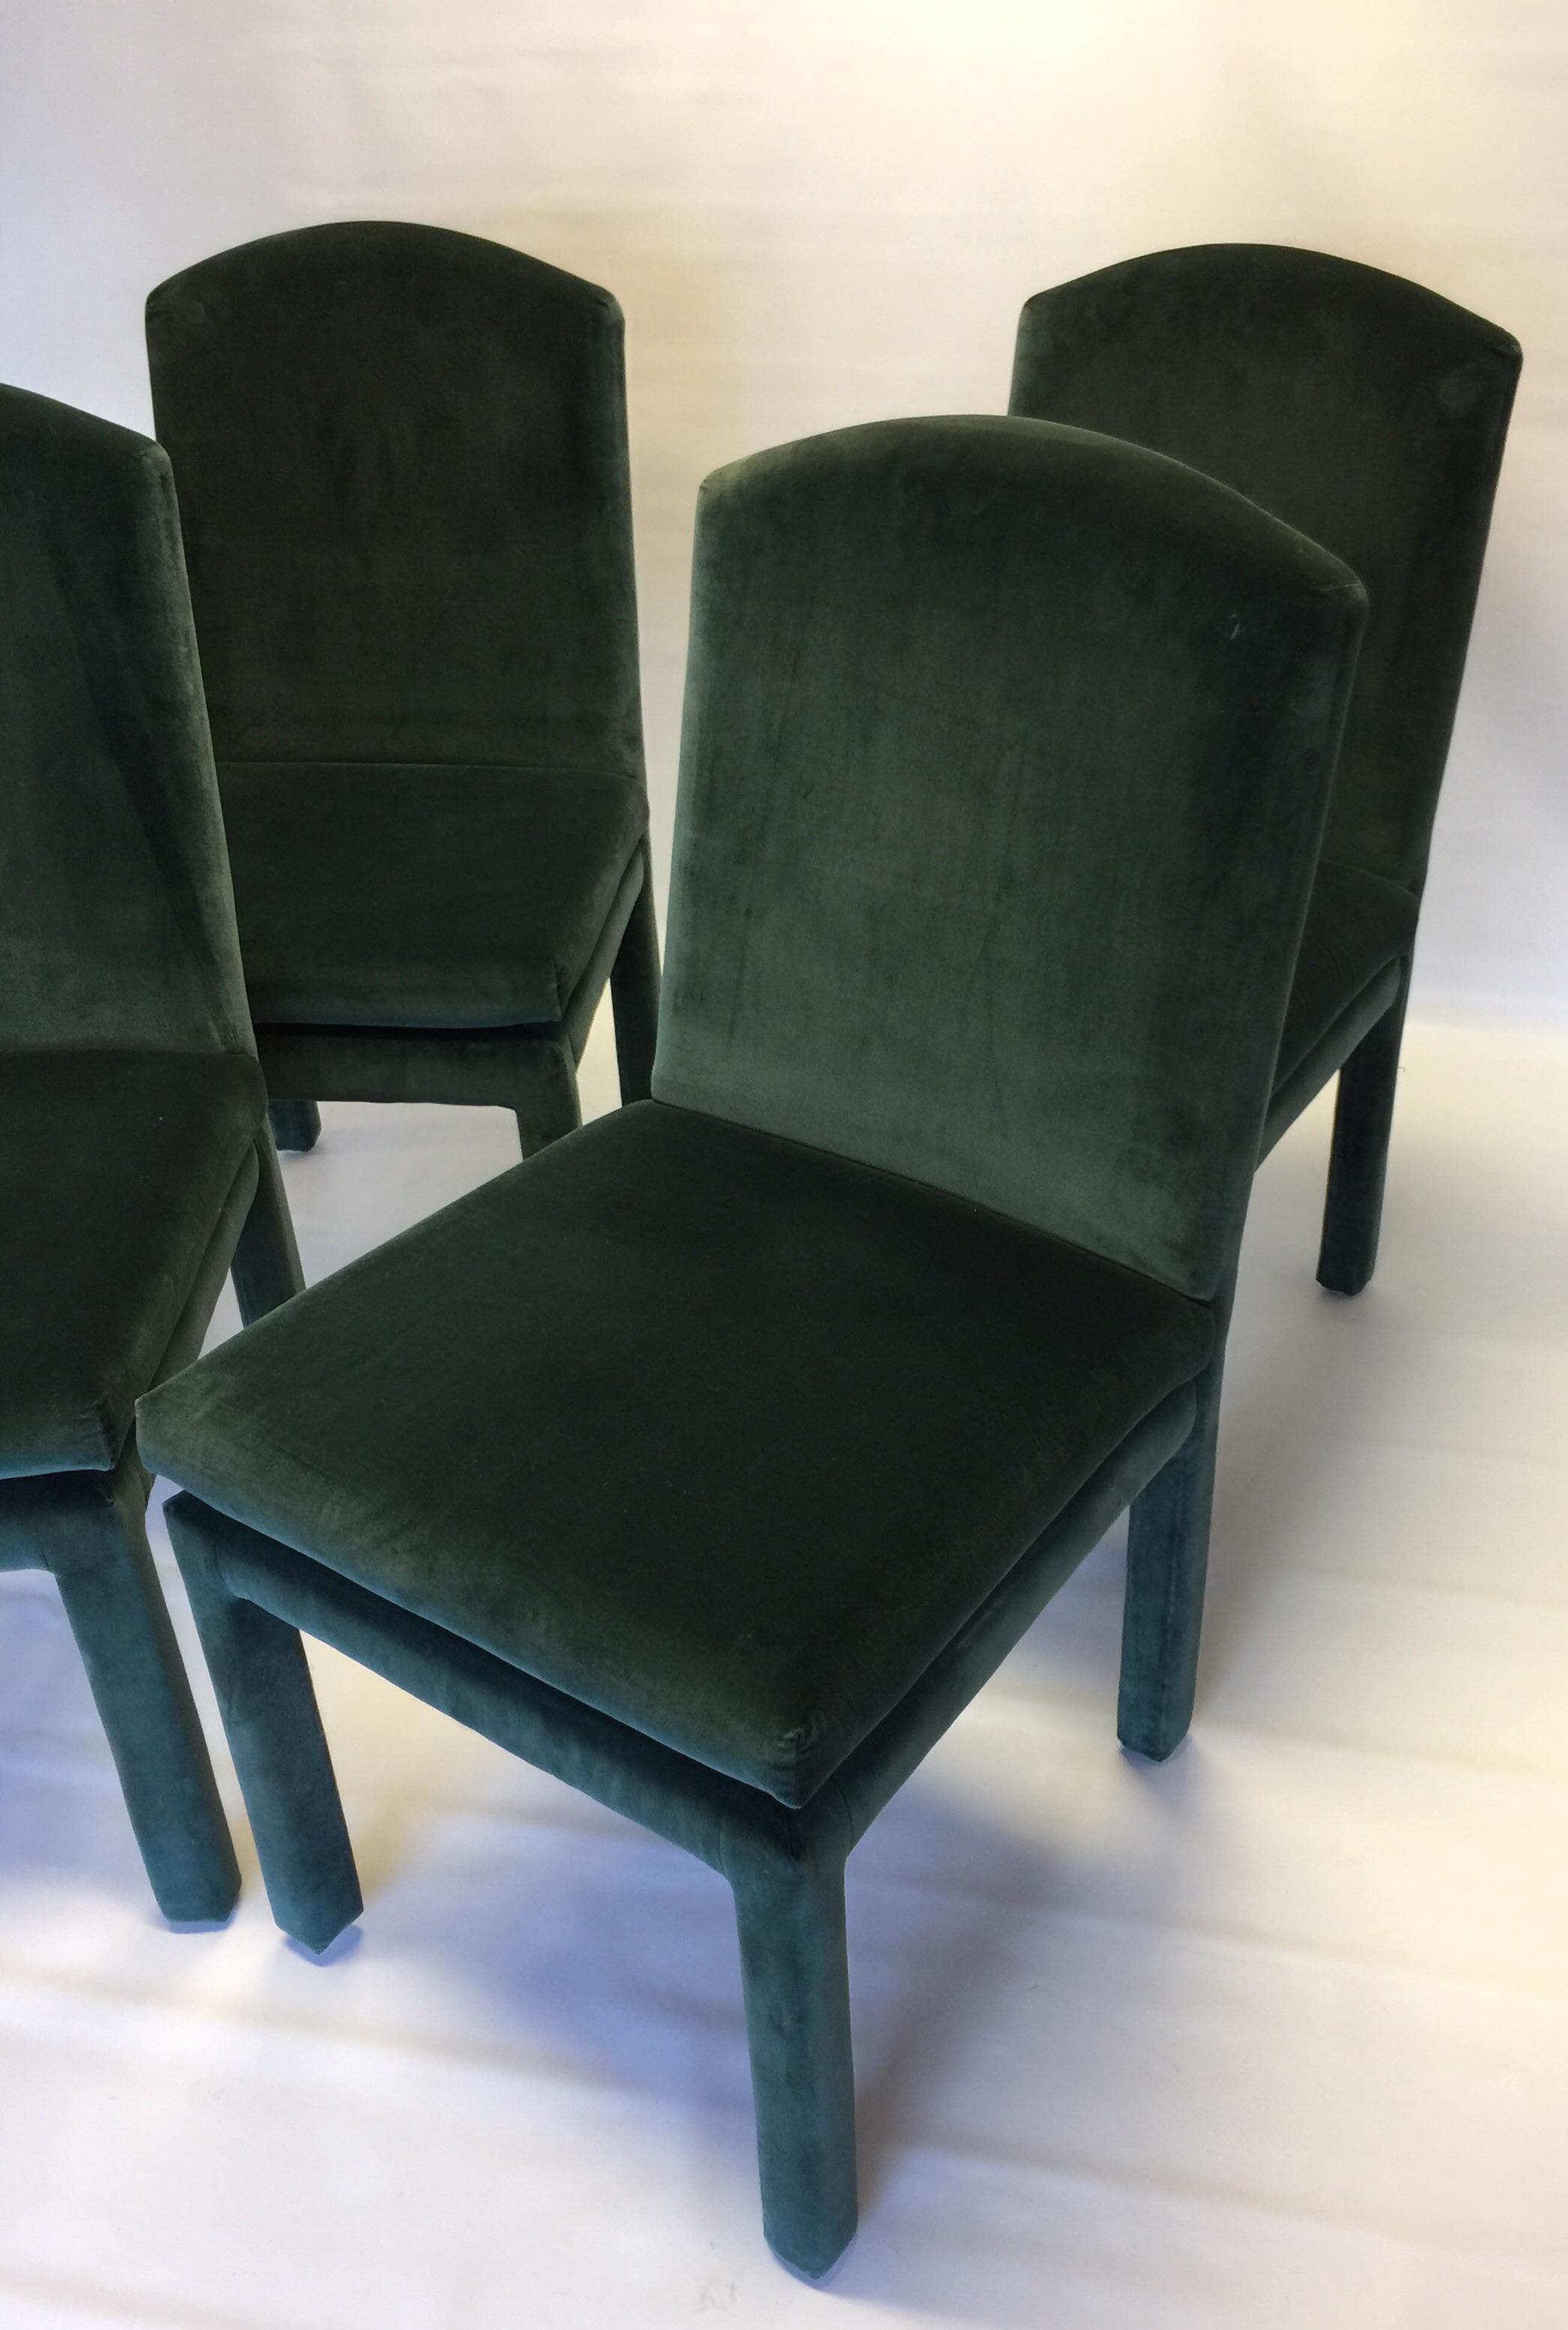 Hollywood Regency Milo Baughman Emerald Green Jewel Tone Velvet Dining  Chairs   Set Of 4 For